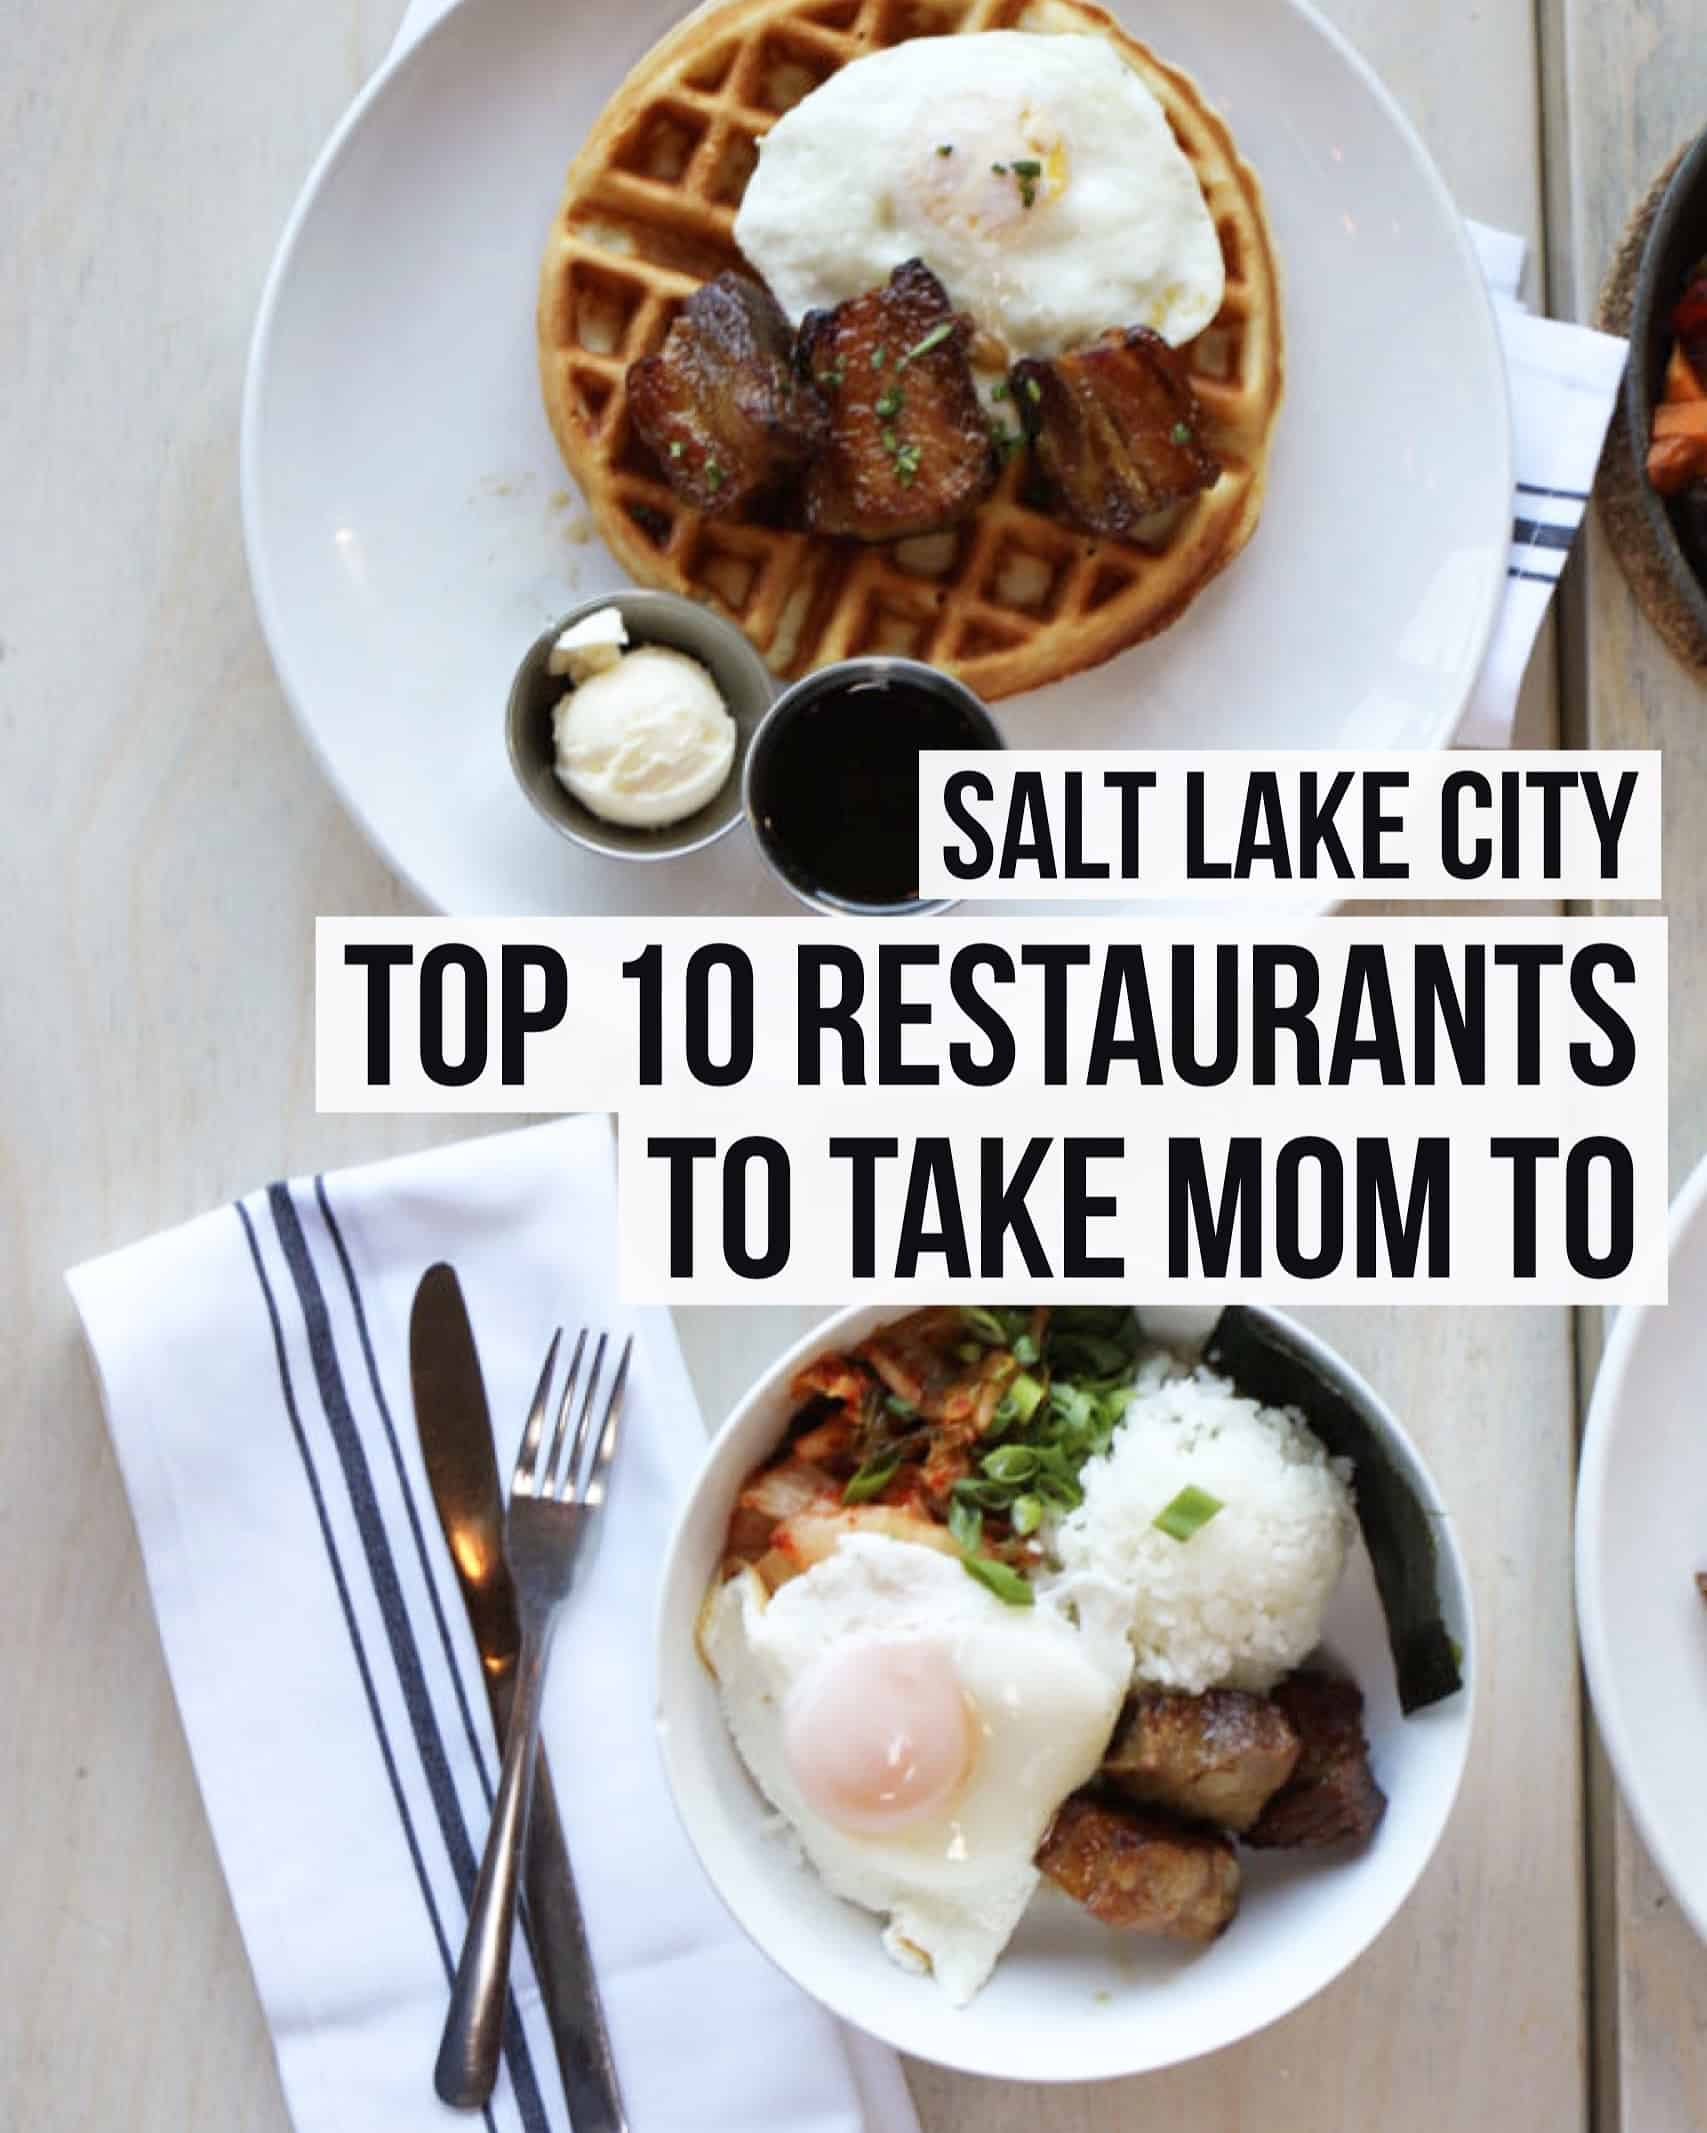 salt lake city top 10 restaurants to take mom to female foodie. Black Bedroom Furniture Sets. Home Design Ideas